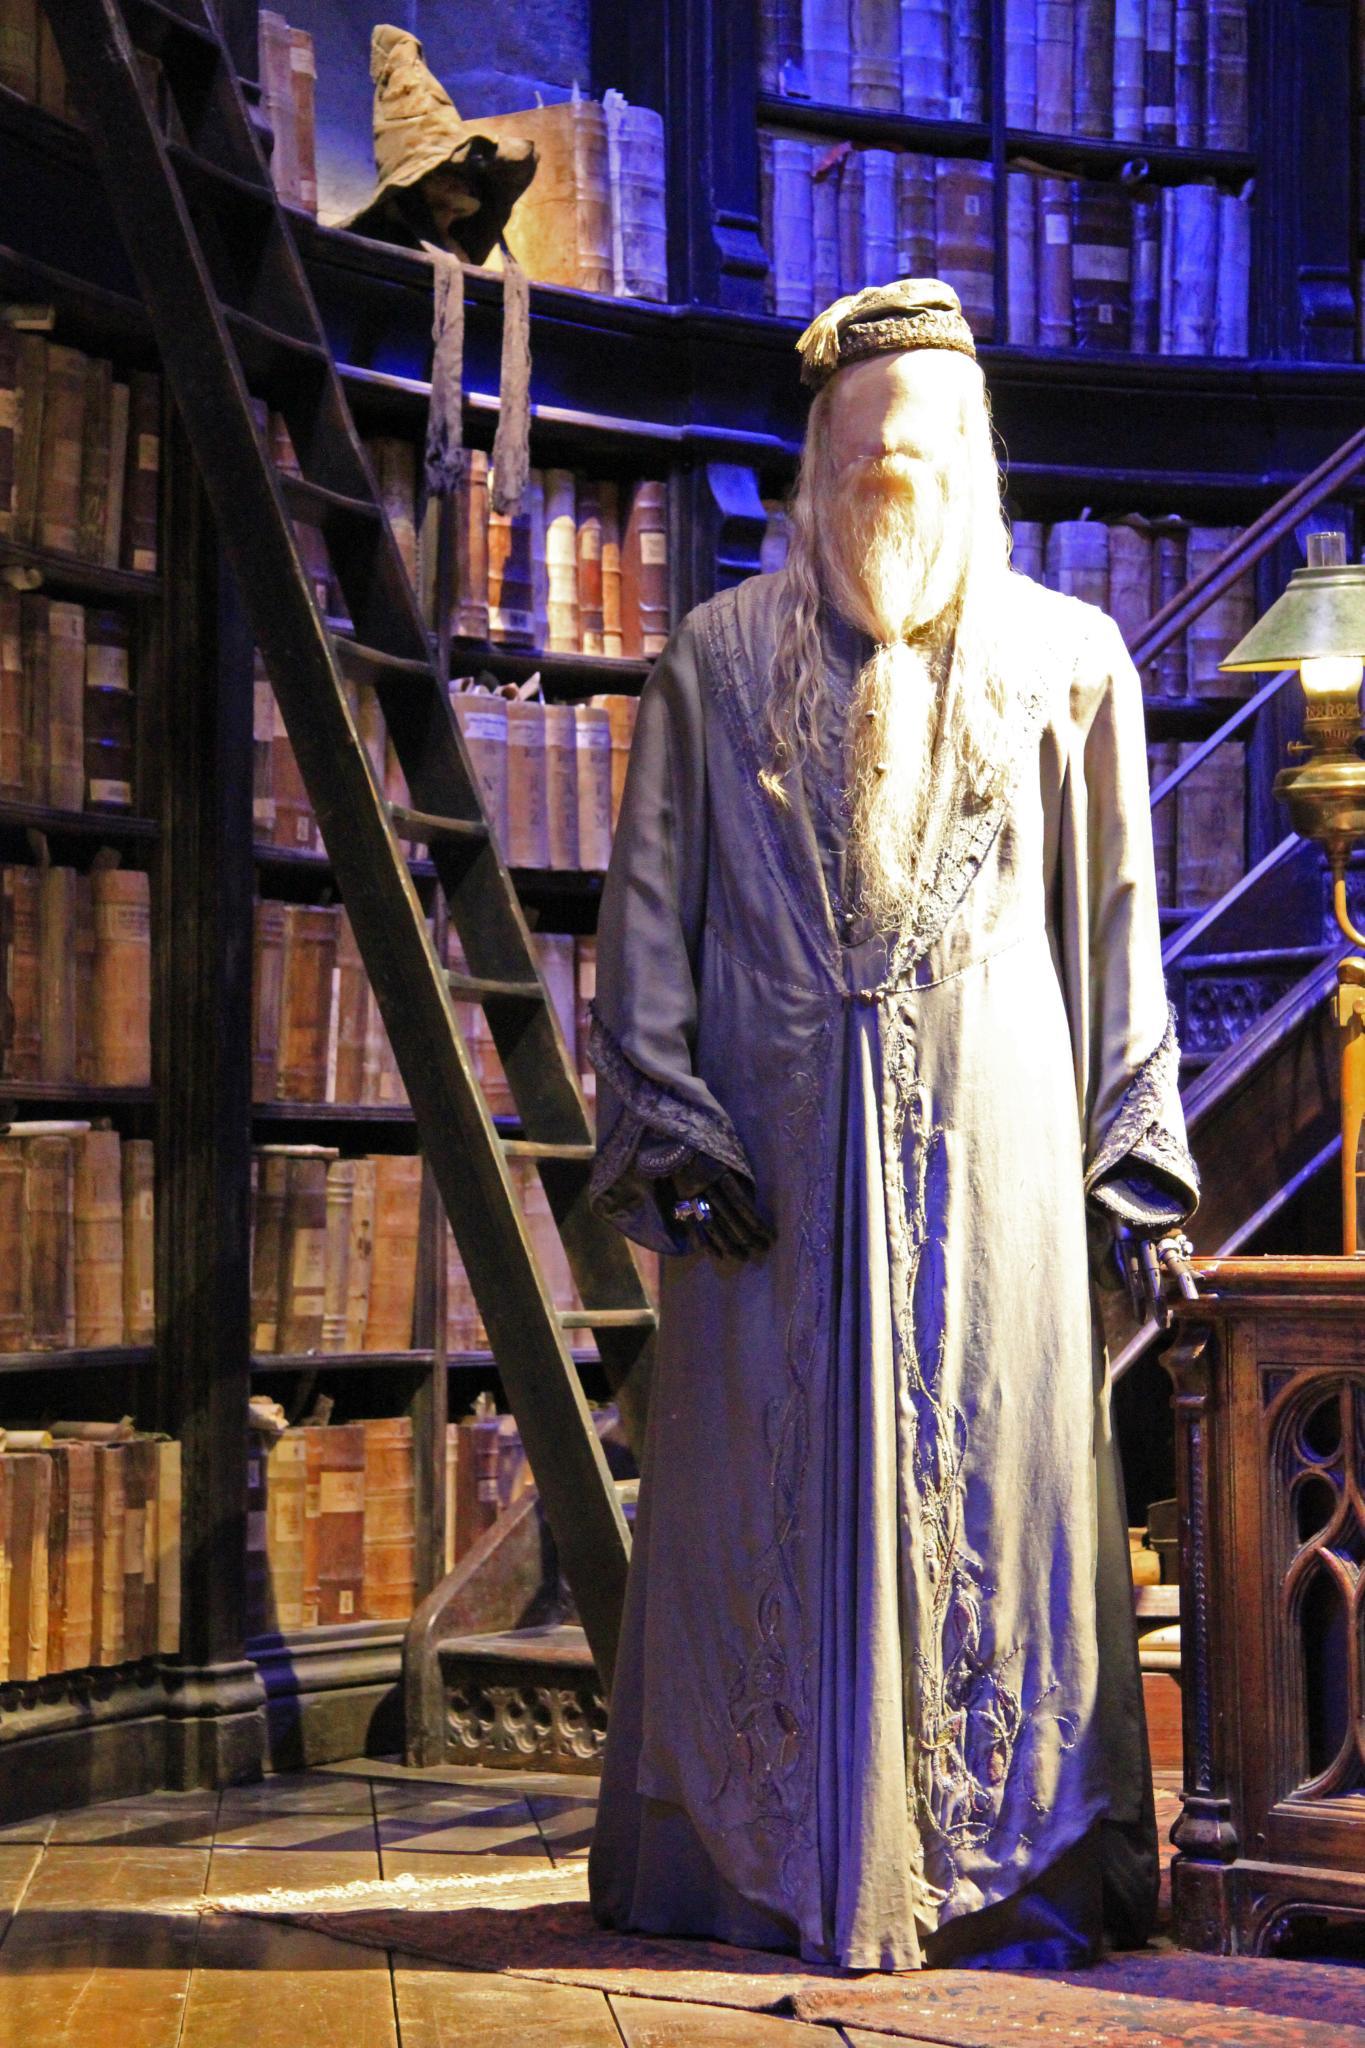 albus dumbledore wikip dia. Black Bedroom Furniture Sets. Home Design Ideas